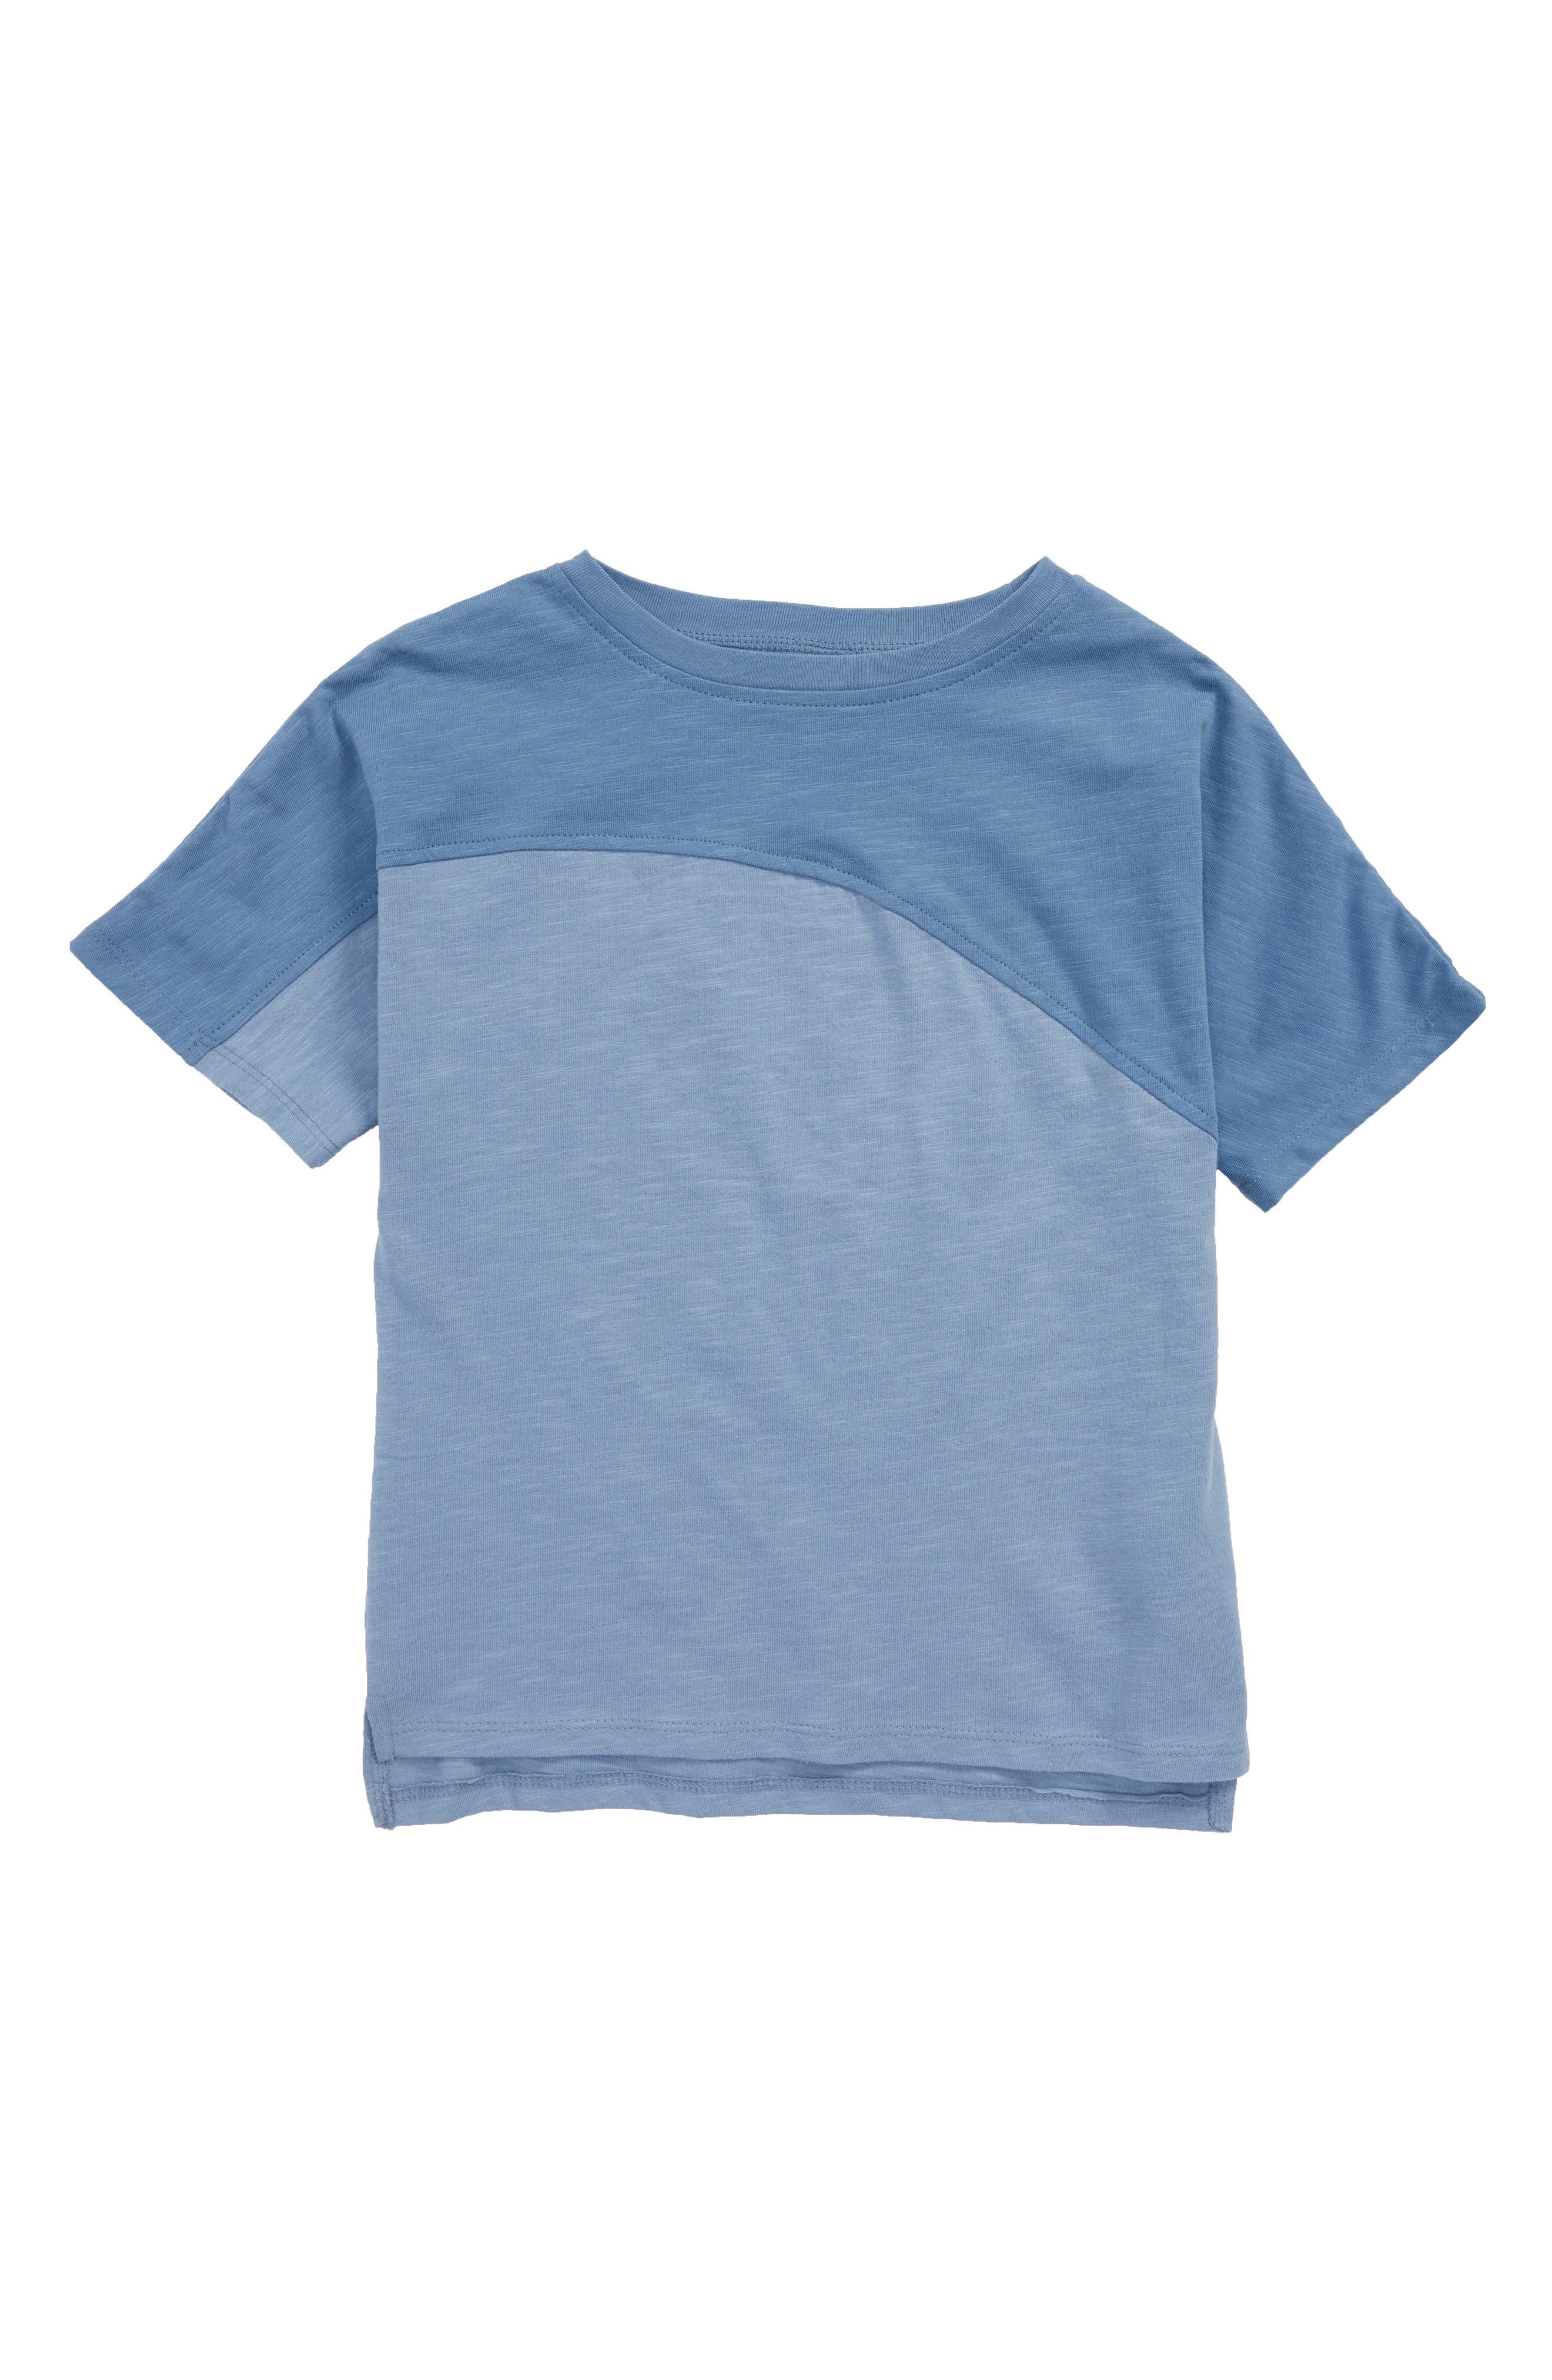 Stem Diagonal Washed T-Shirt (Toddler Boys, Little Boys & Big Boys)